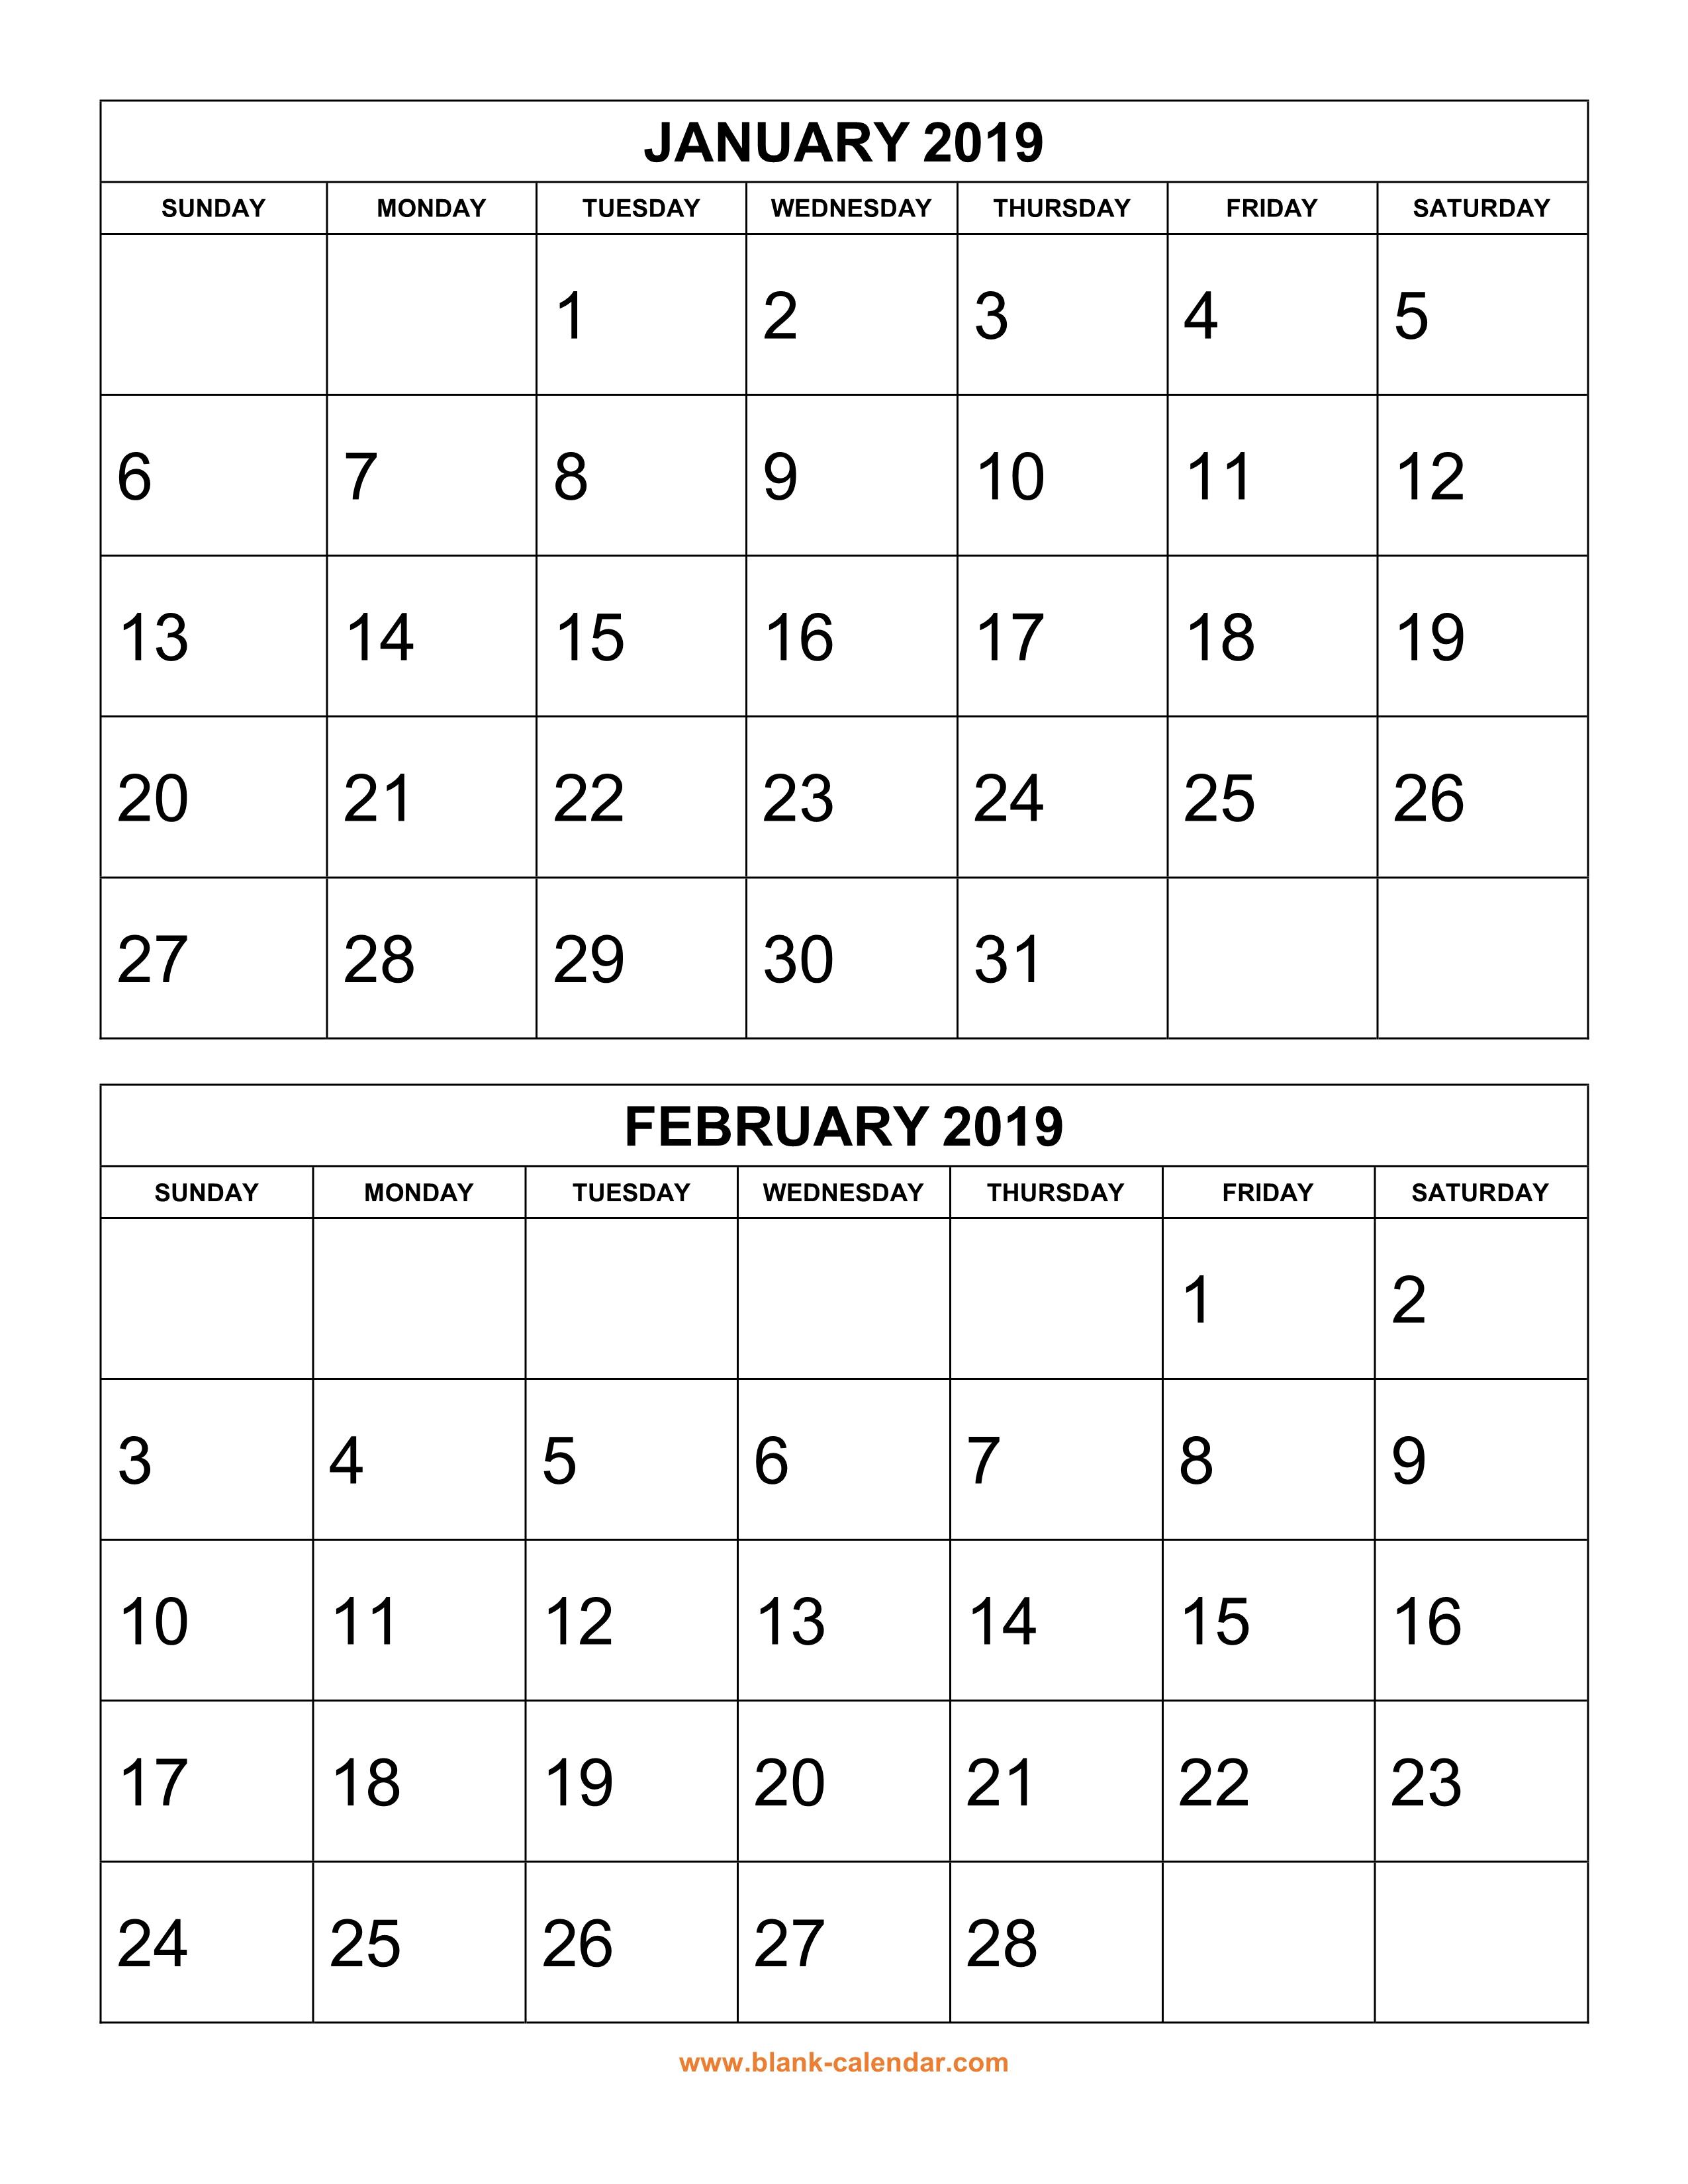 Print Blank Calendar By Month